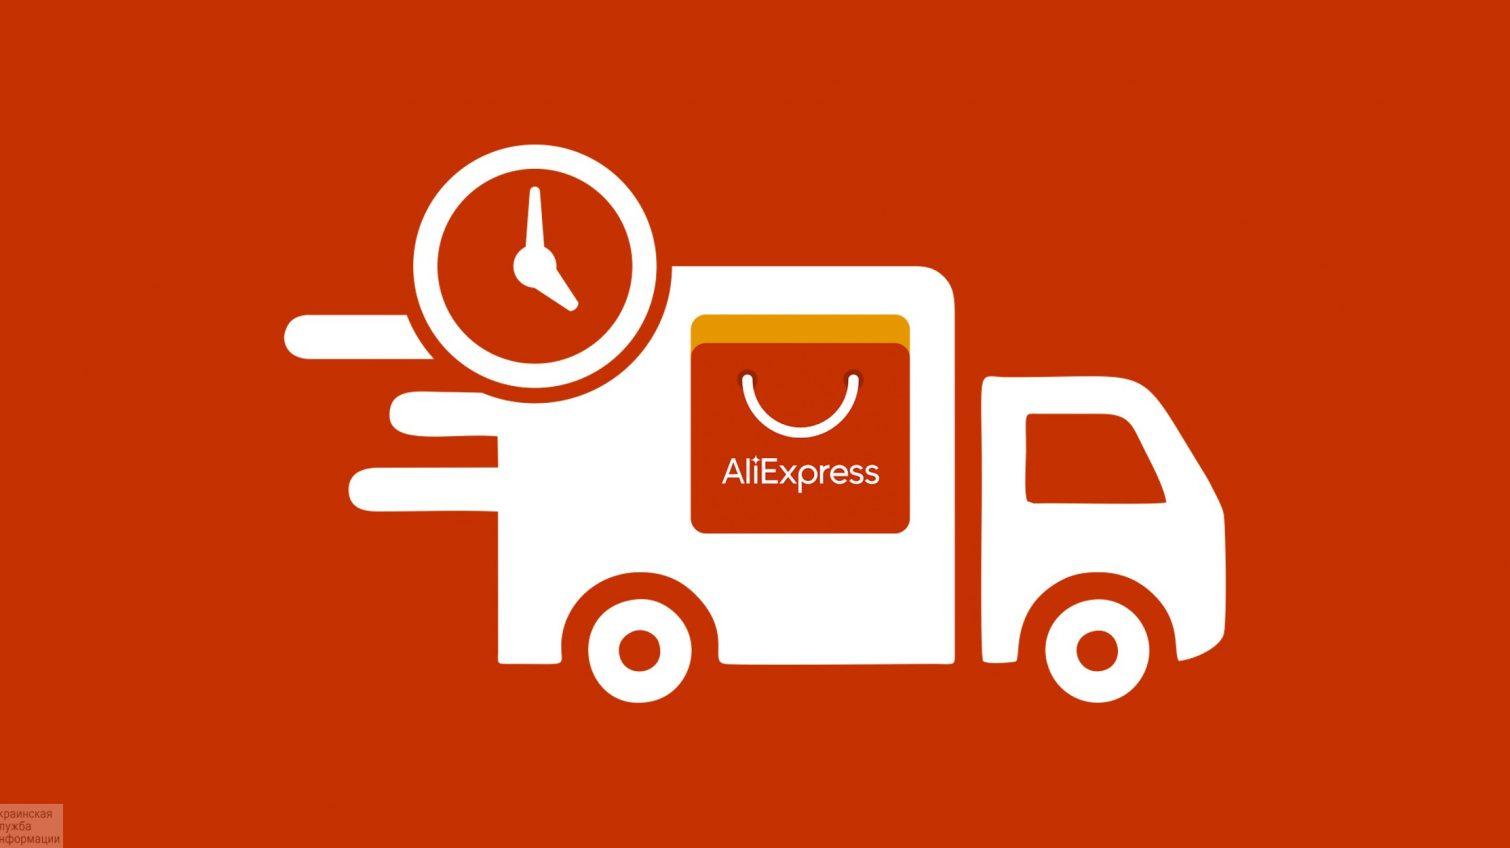 AliExpress приостановил доставку посылок из Китая из-за коронавируса (фото) «фото»